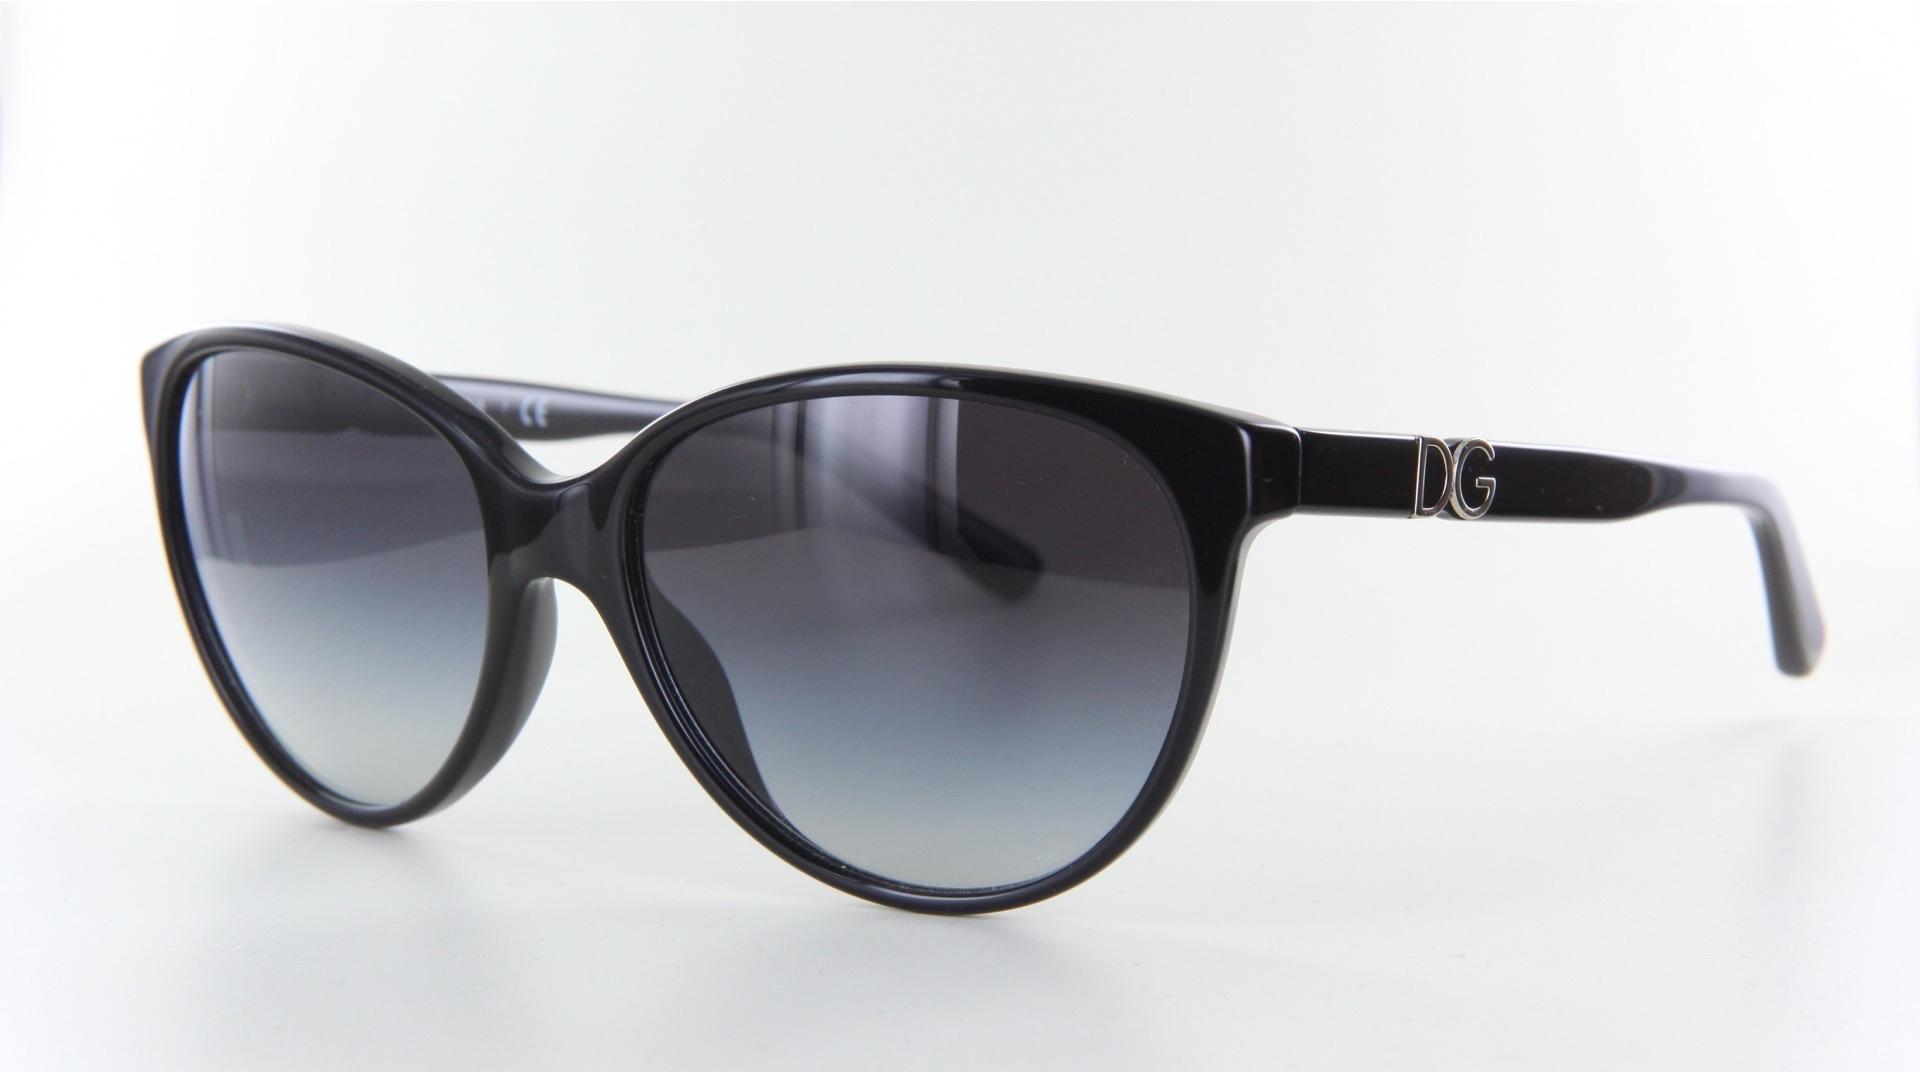 Dolce & Gabbana - ref: 72096